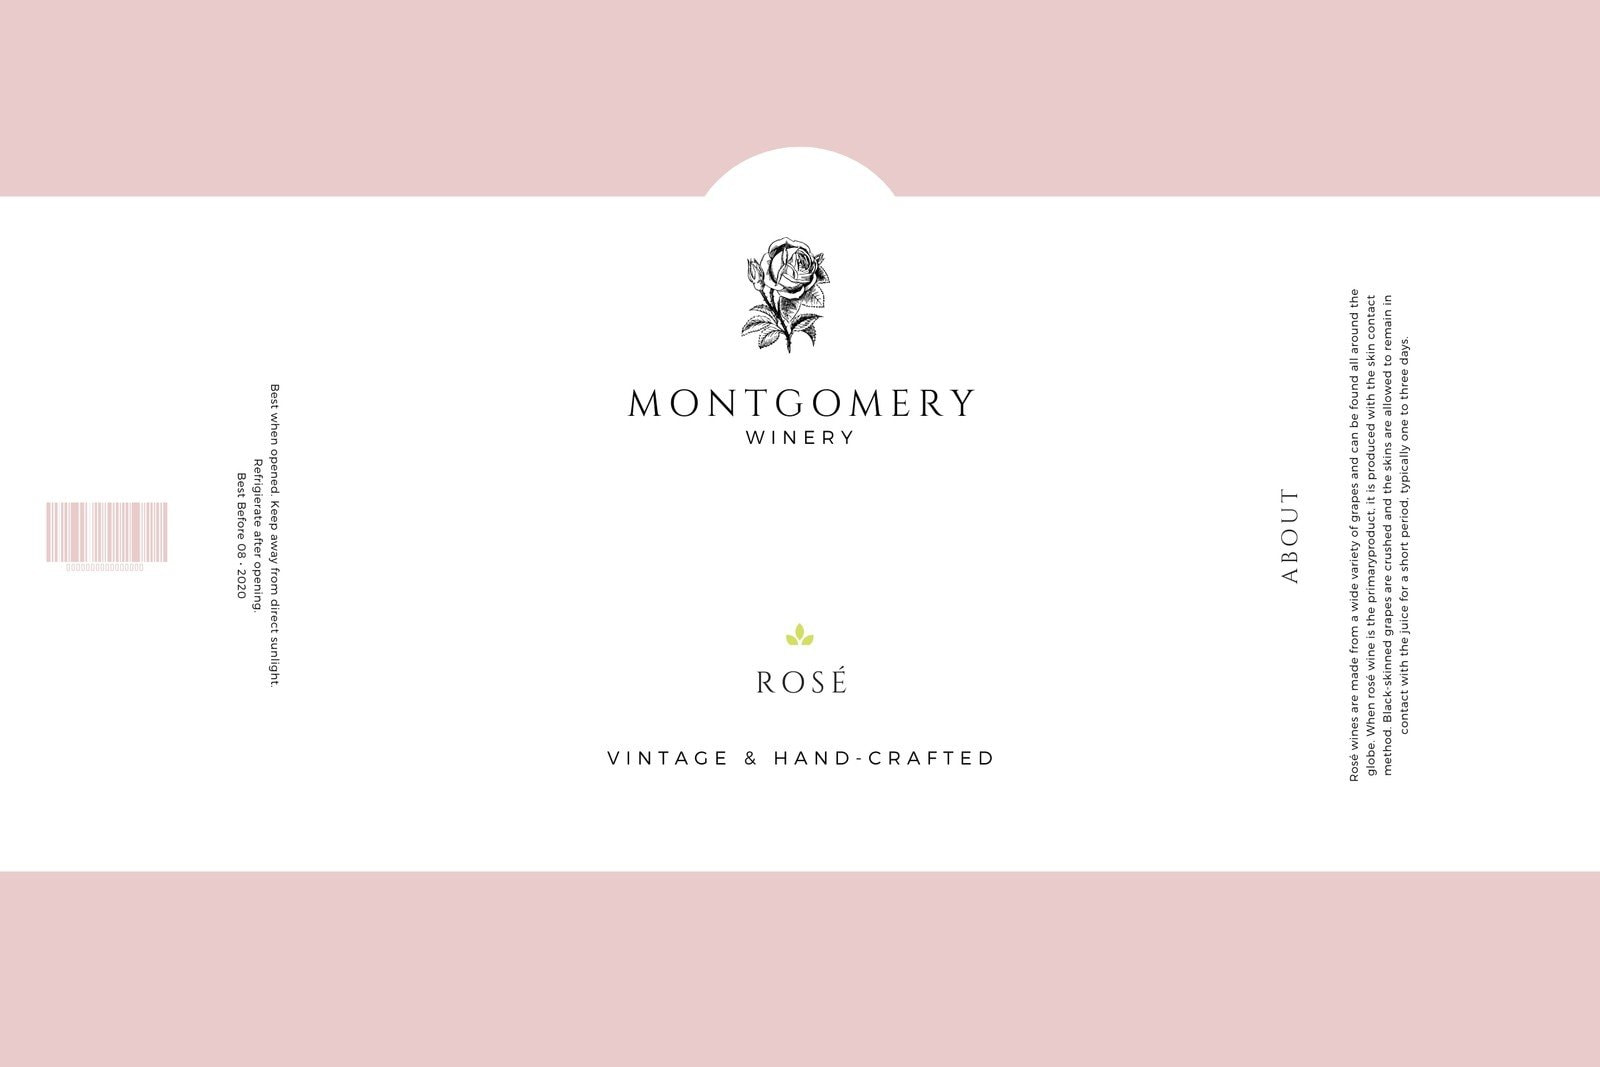 Pale Pink & White Minimalist Simple Elegant Wine Bottle Label